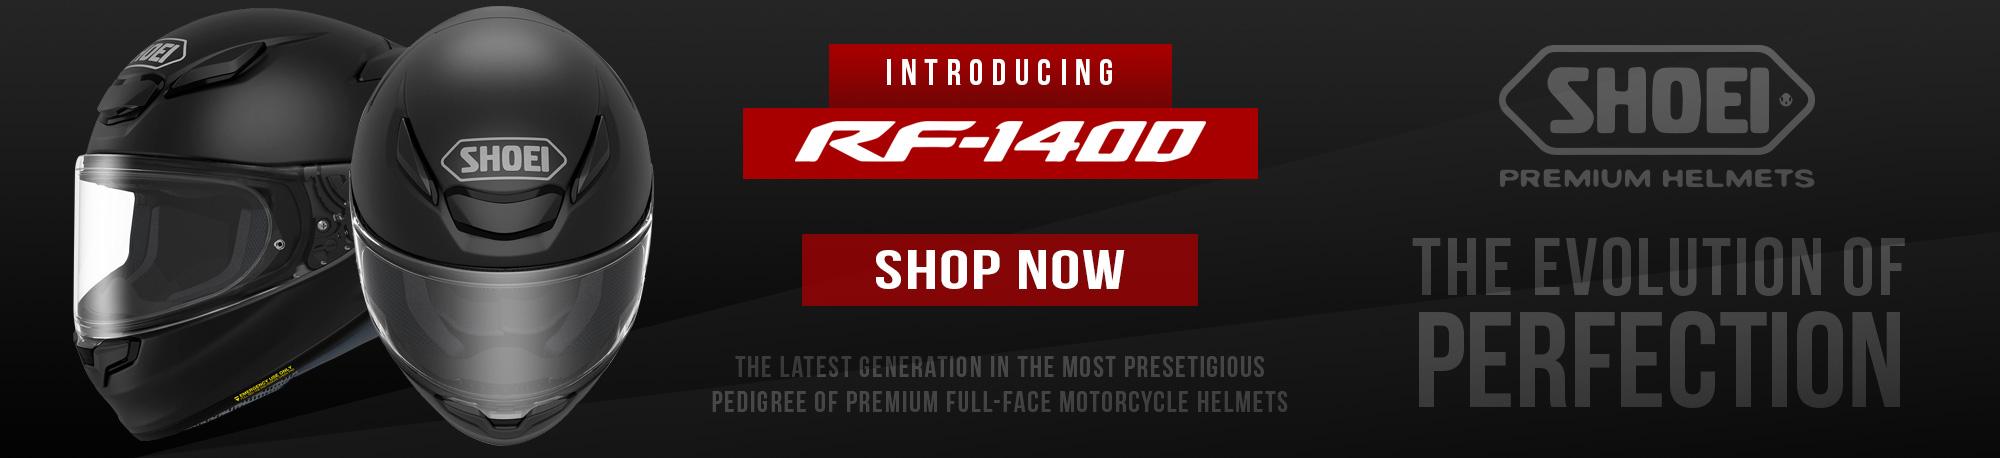 Introducing RF-1400